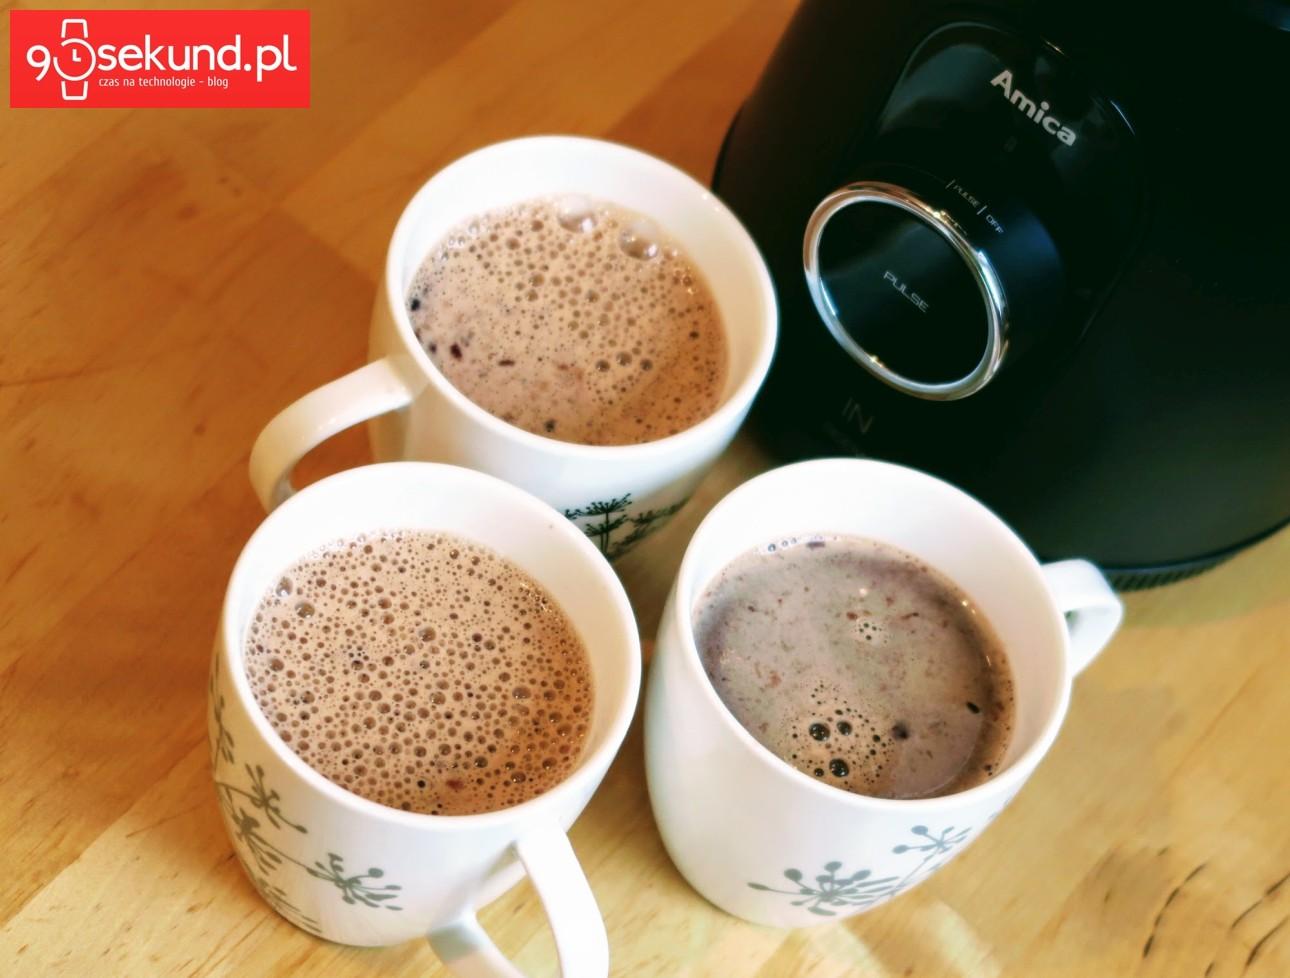 Kawa z lodami z blendera Amica BTK 5011 IN - 90sekund.pl